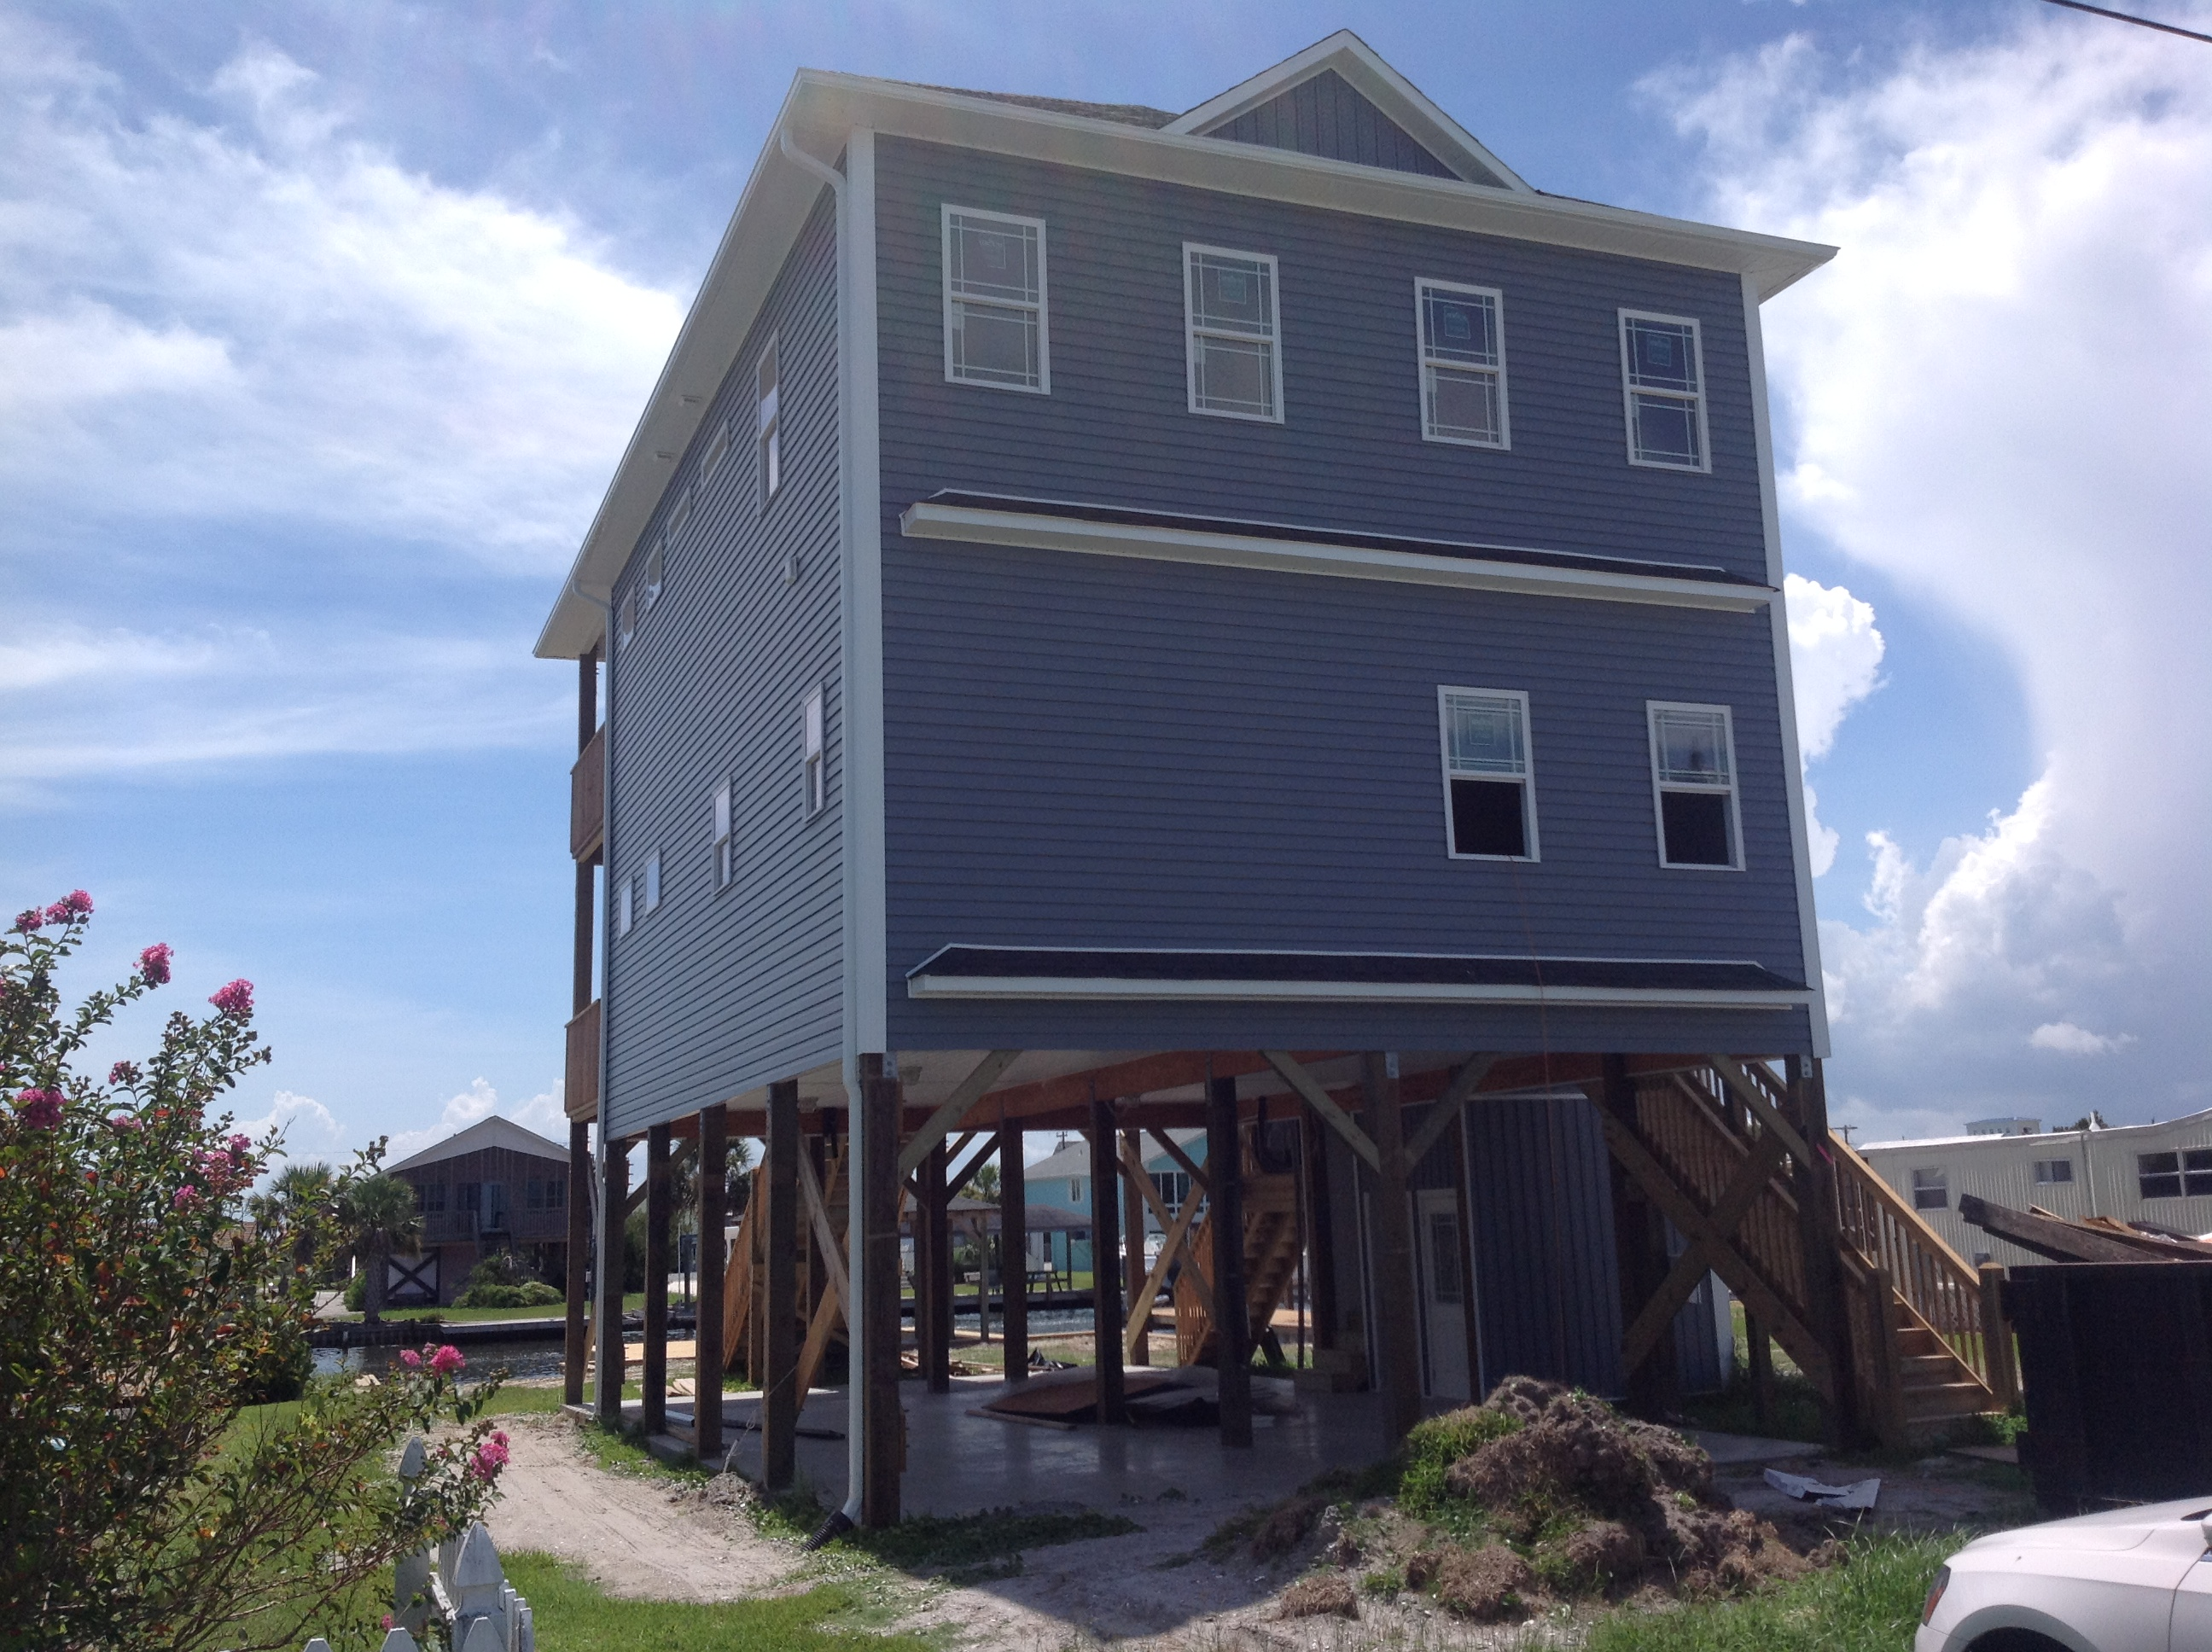 獨棟家庭住宅 為 出售 在 Canal front new home ready to be customized 7061 7th St Surf City, 北卡羅來納州 28445 美國